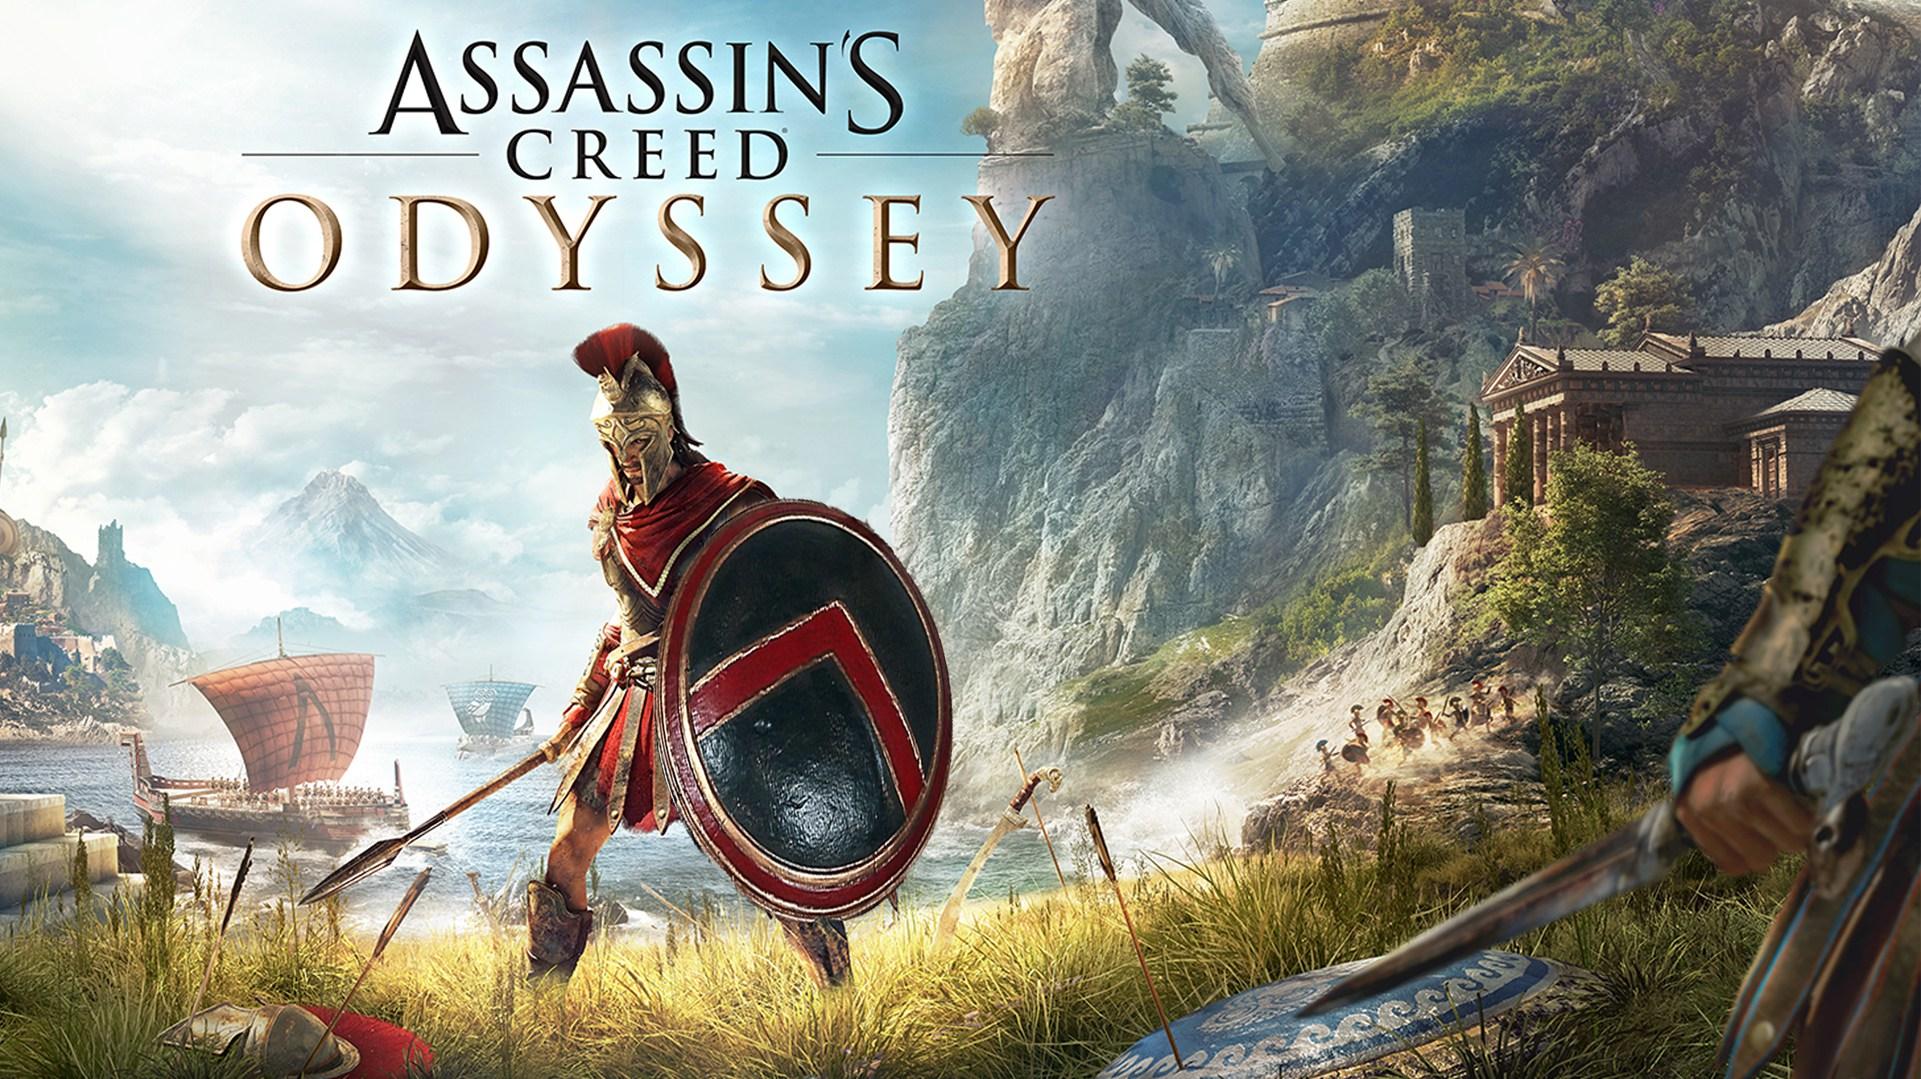 Assassins Creed Odyssey PC sistemaren eskakizunak